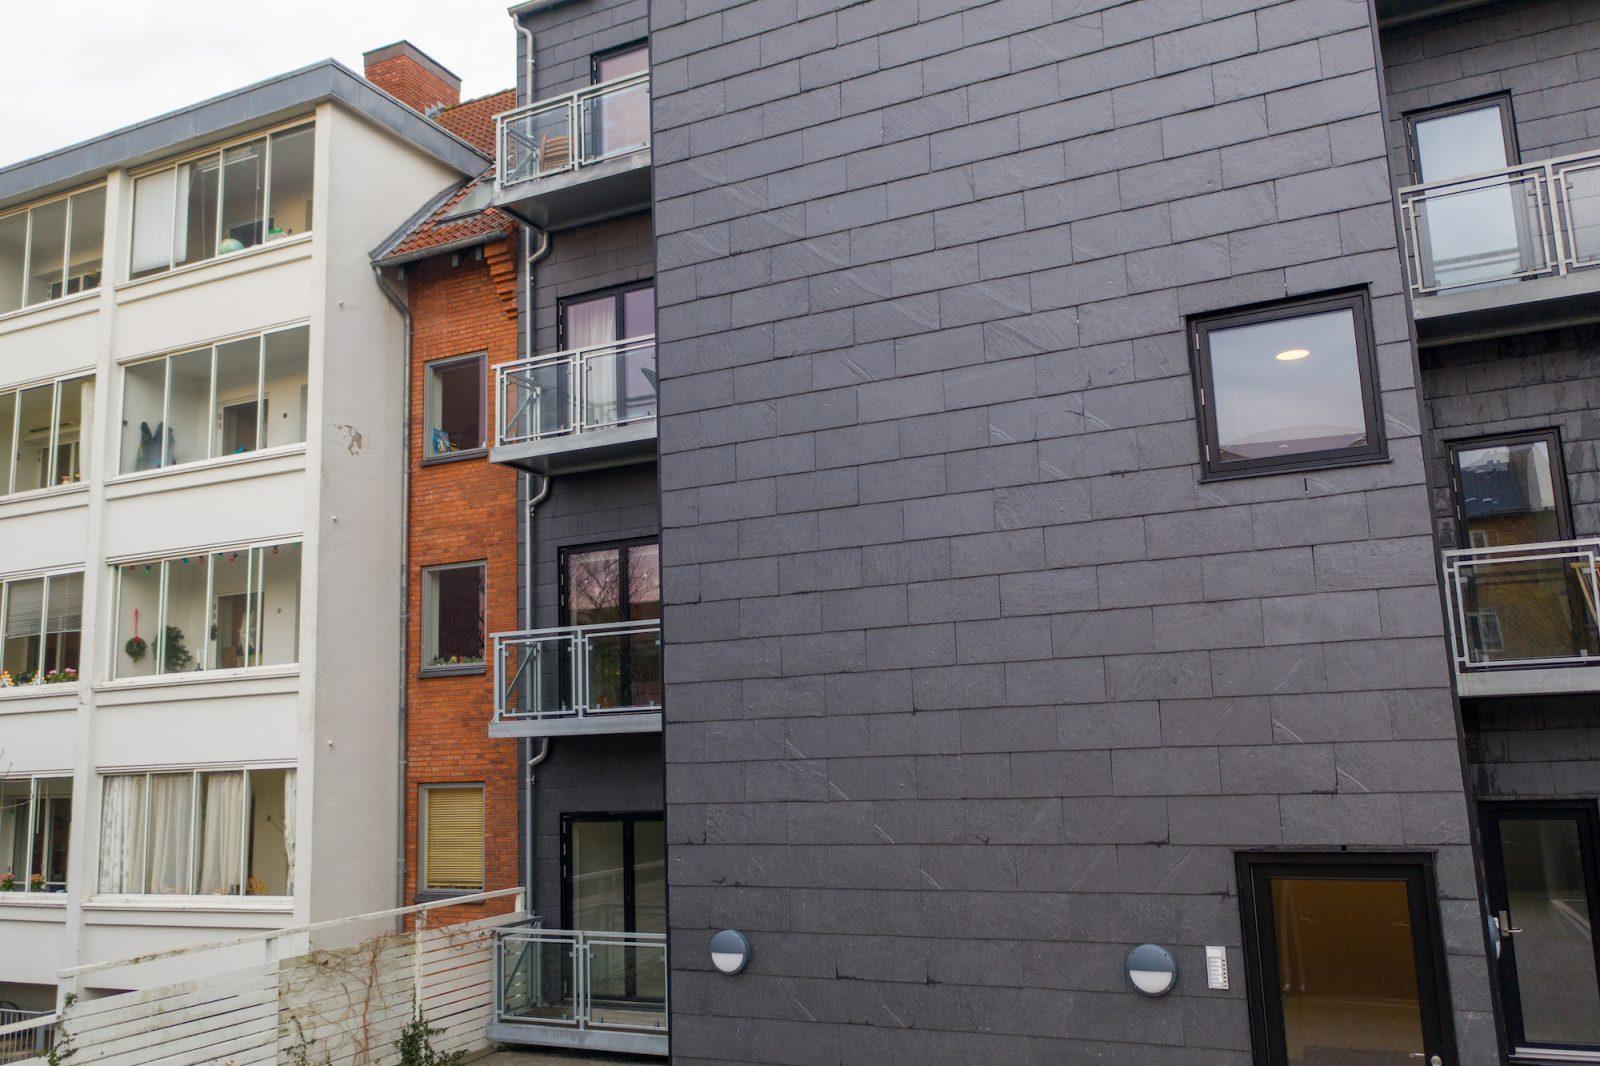 Bygning på Nyborgvej- Safe-con - 8